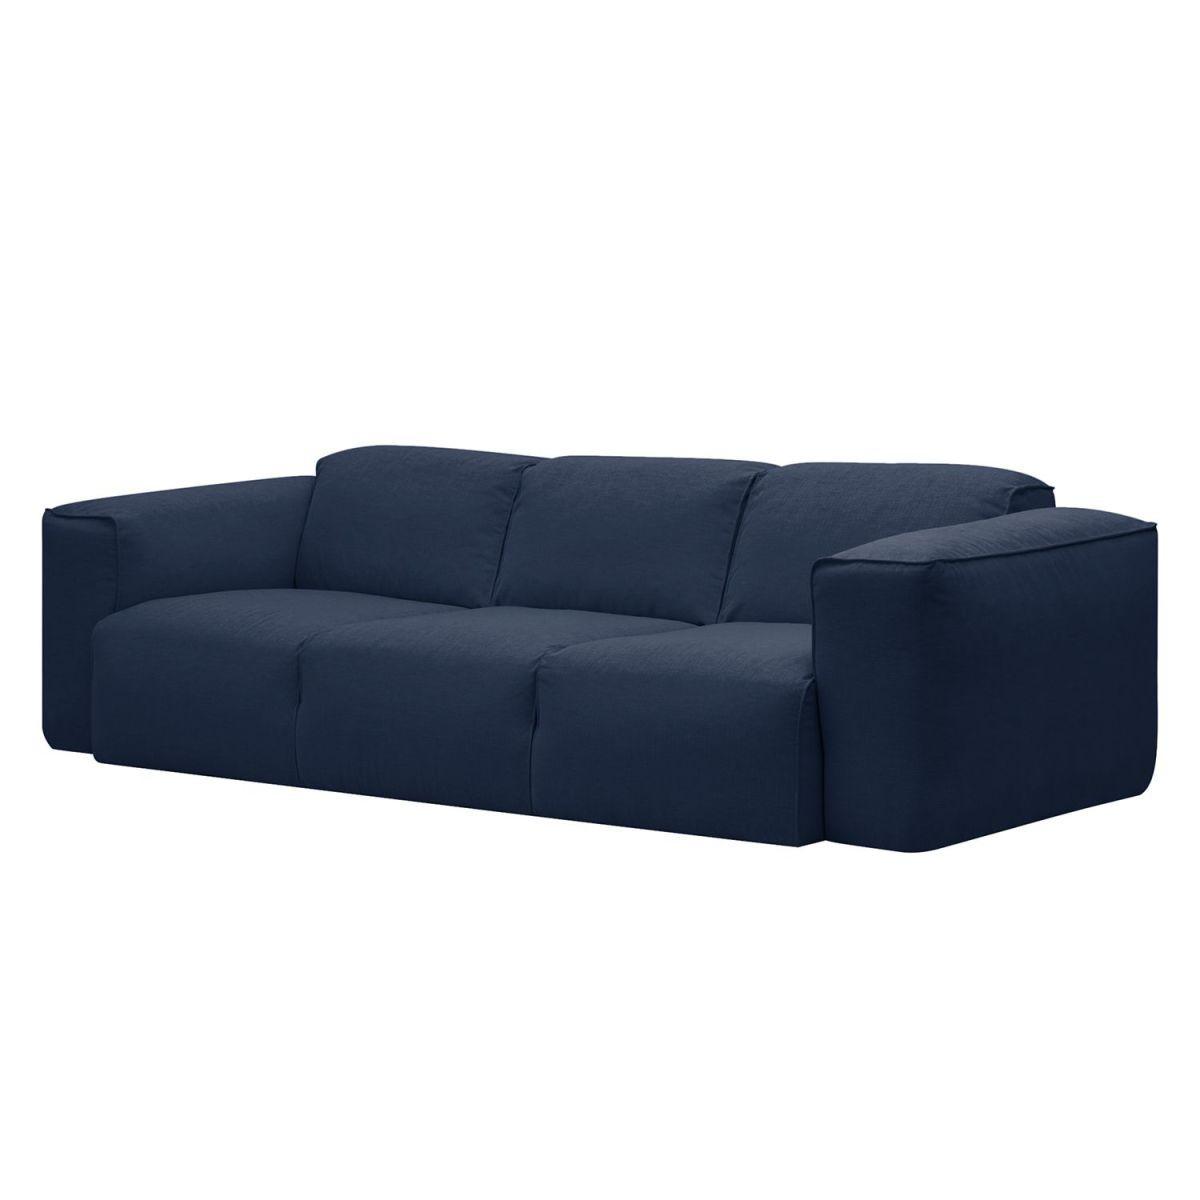 Quelle Sofa sofa hudson i 3 sitzer webstoff stoff milan dunkelblau jetzt